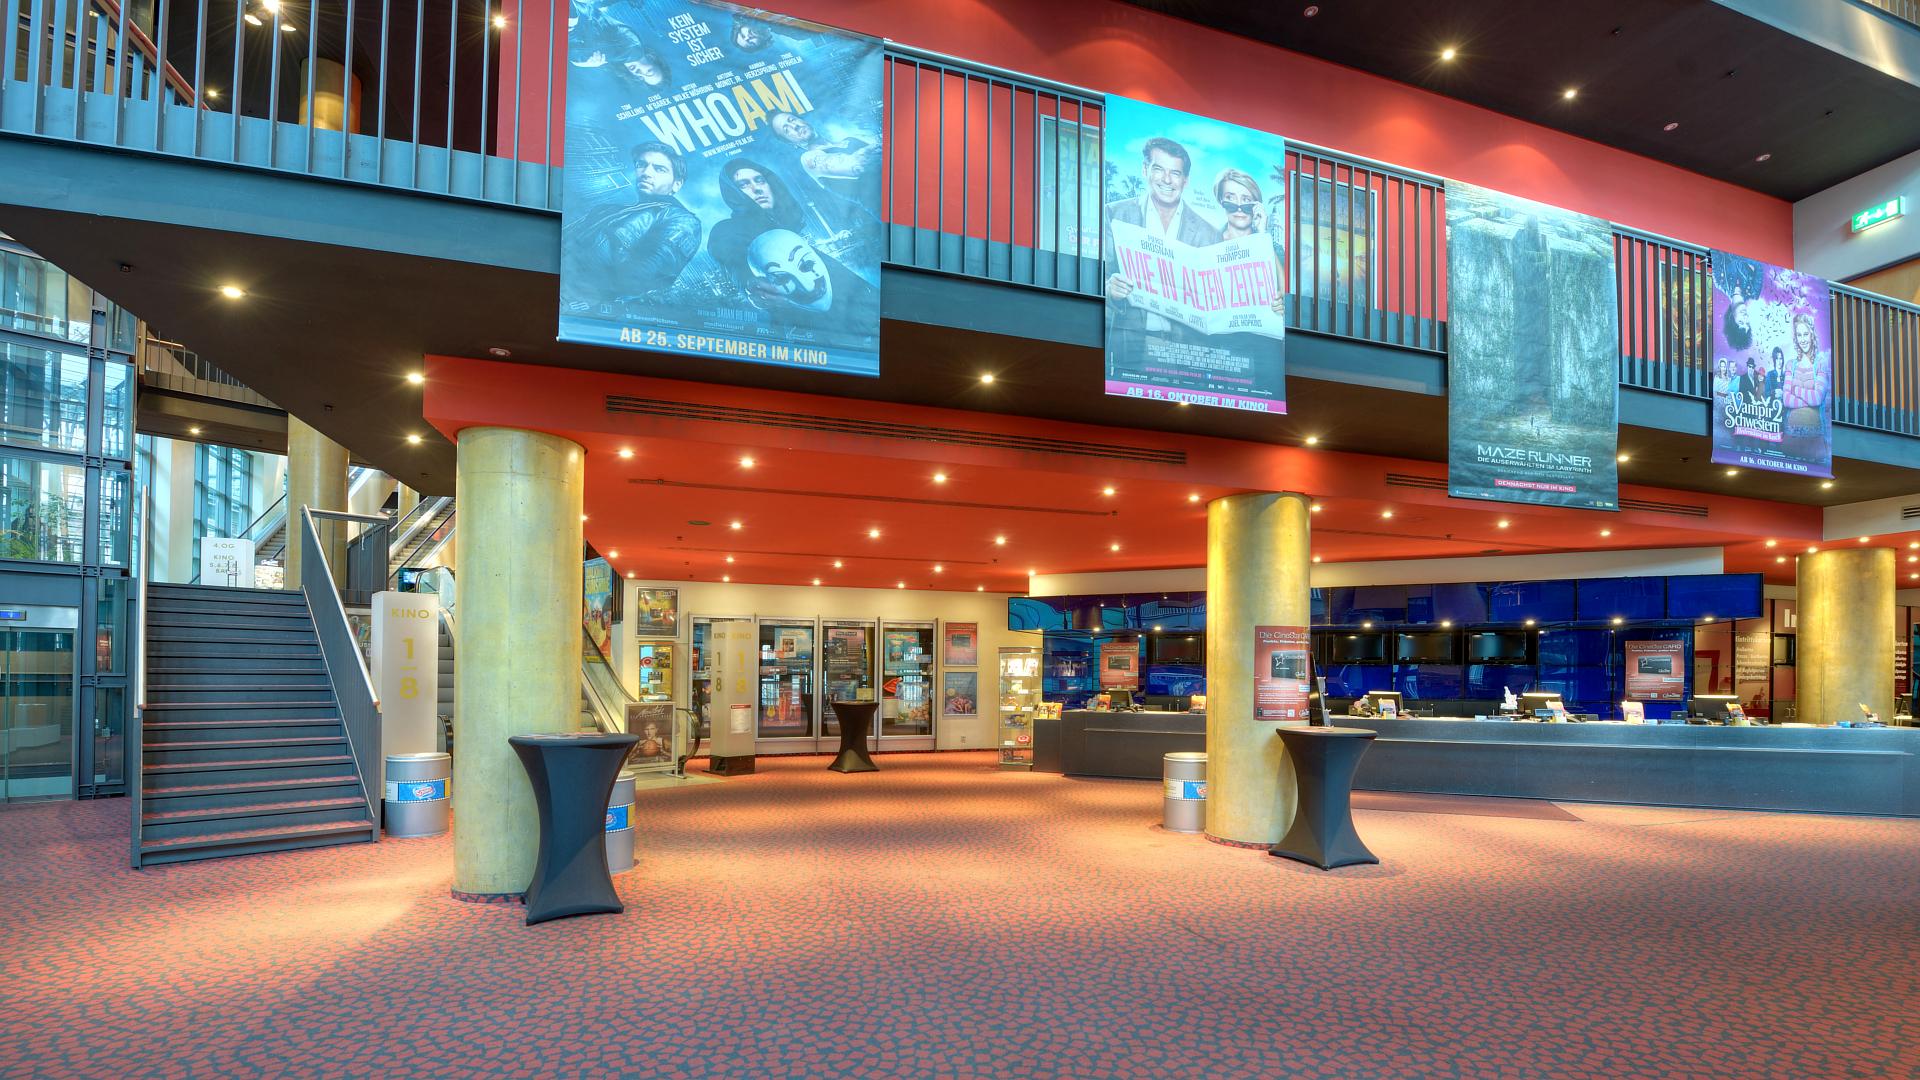 Leipzig Kino Cinestar